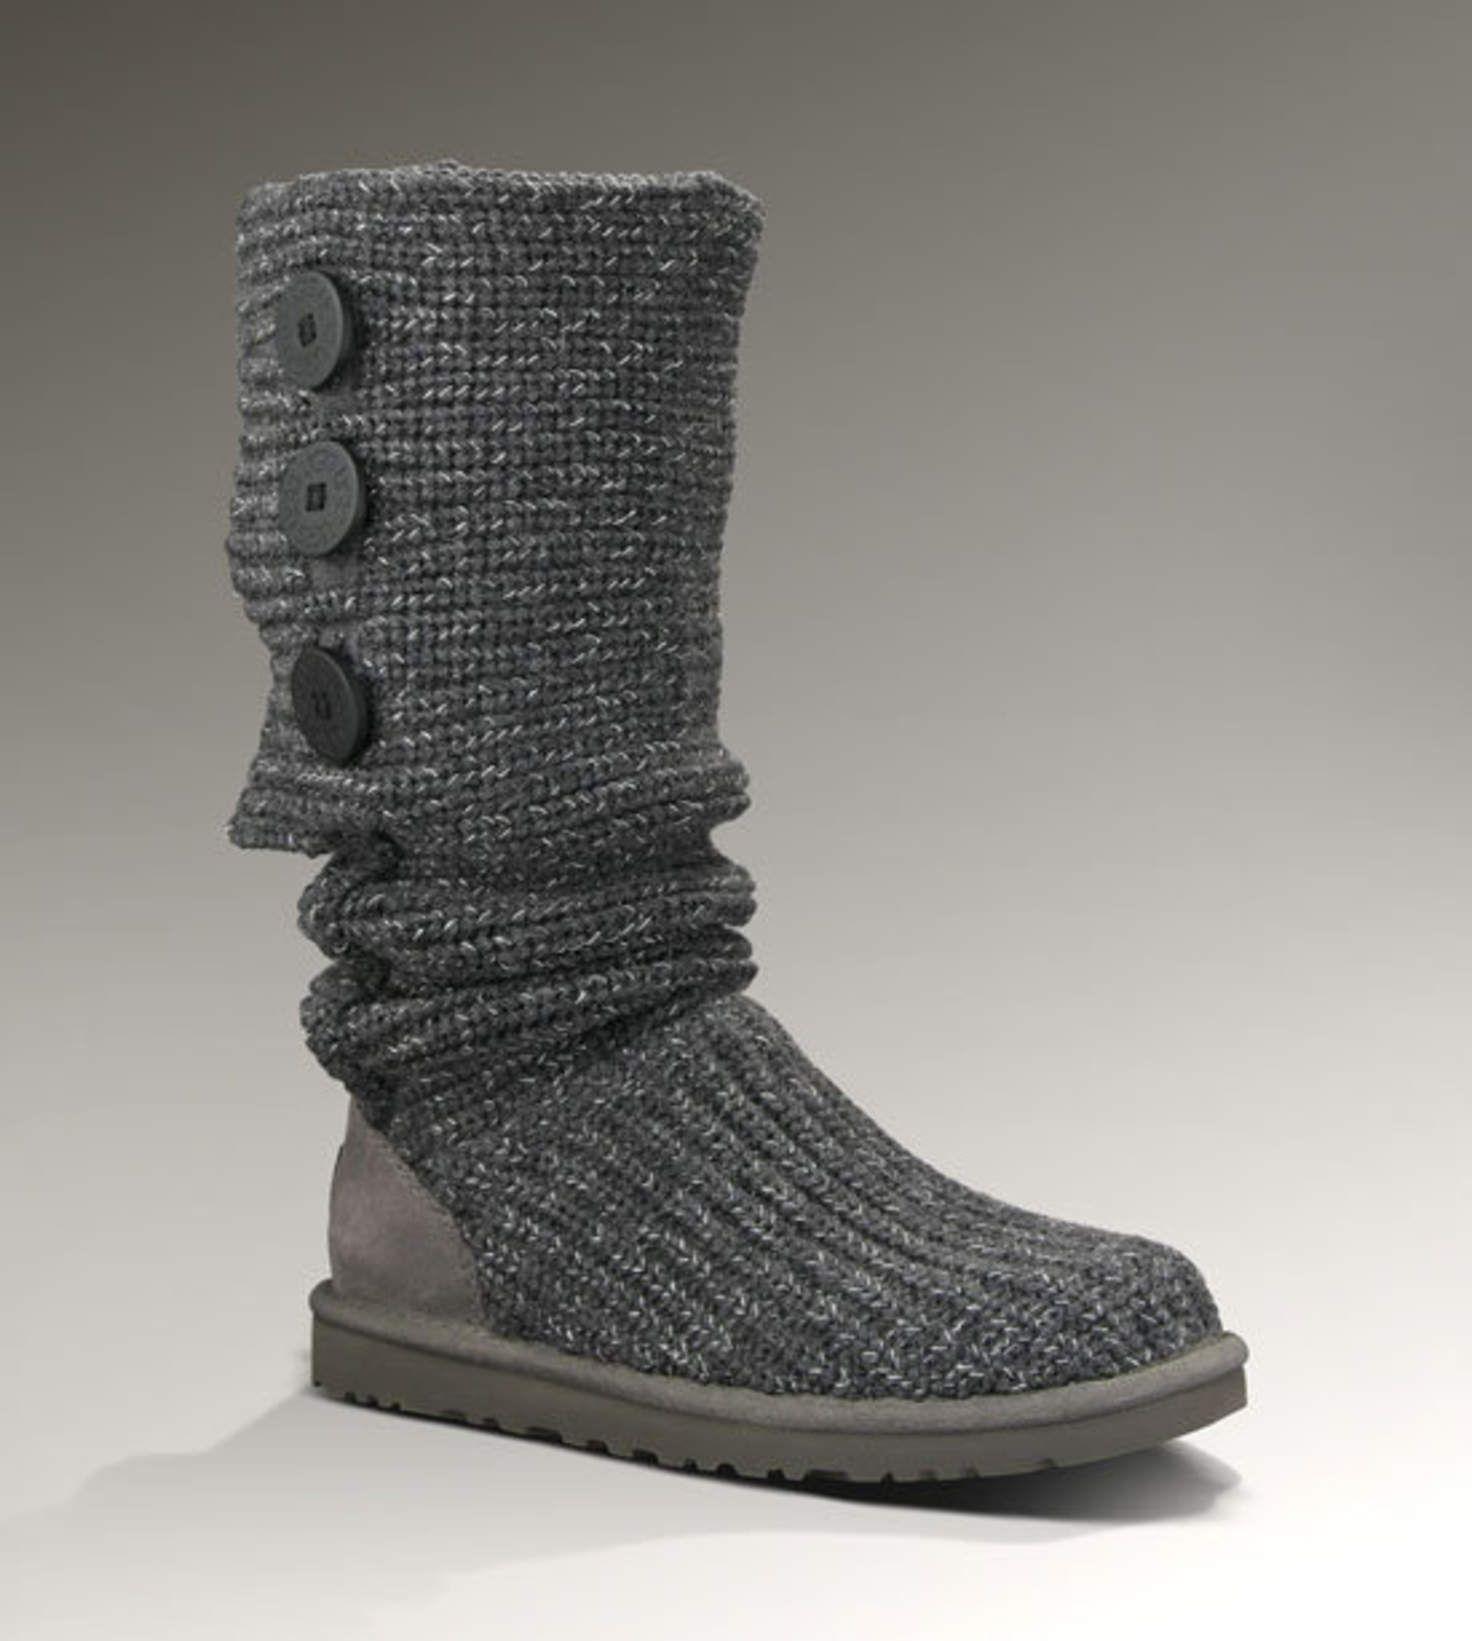 97e033b3034 Womens Classic Cardy Metallic by UGG Australia   shoes;   Ugg ...